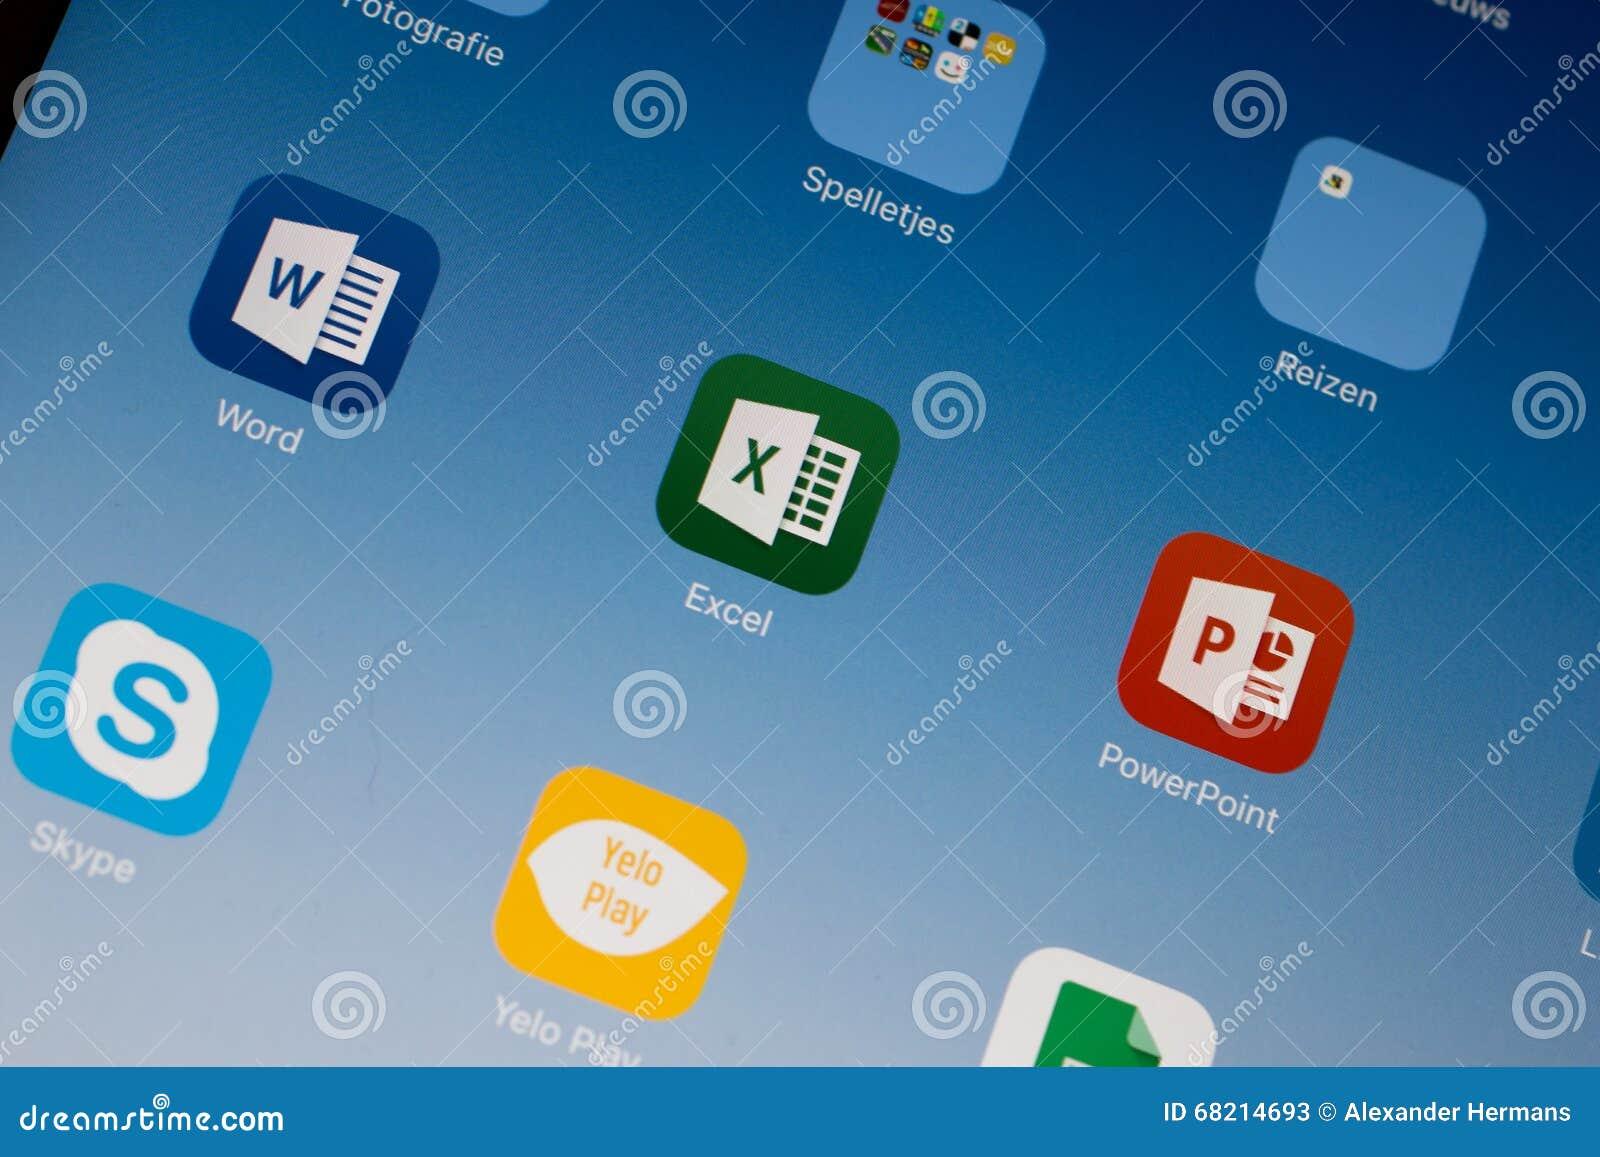 Microsoft Office Excel/Word/Powerpoint application thumbnail / logo on an iPad Air